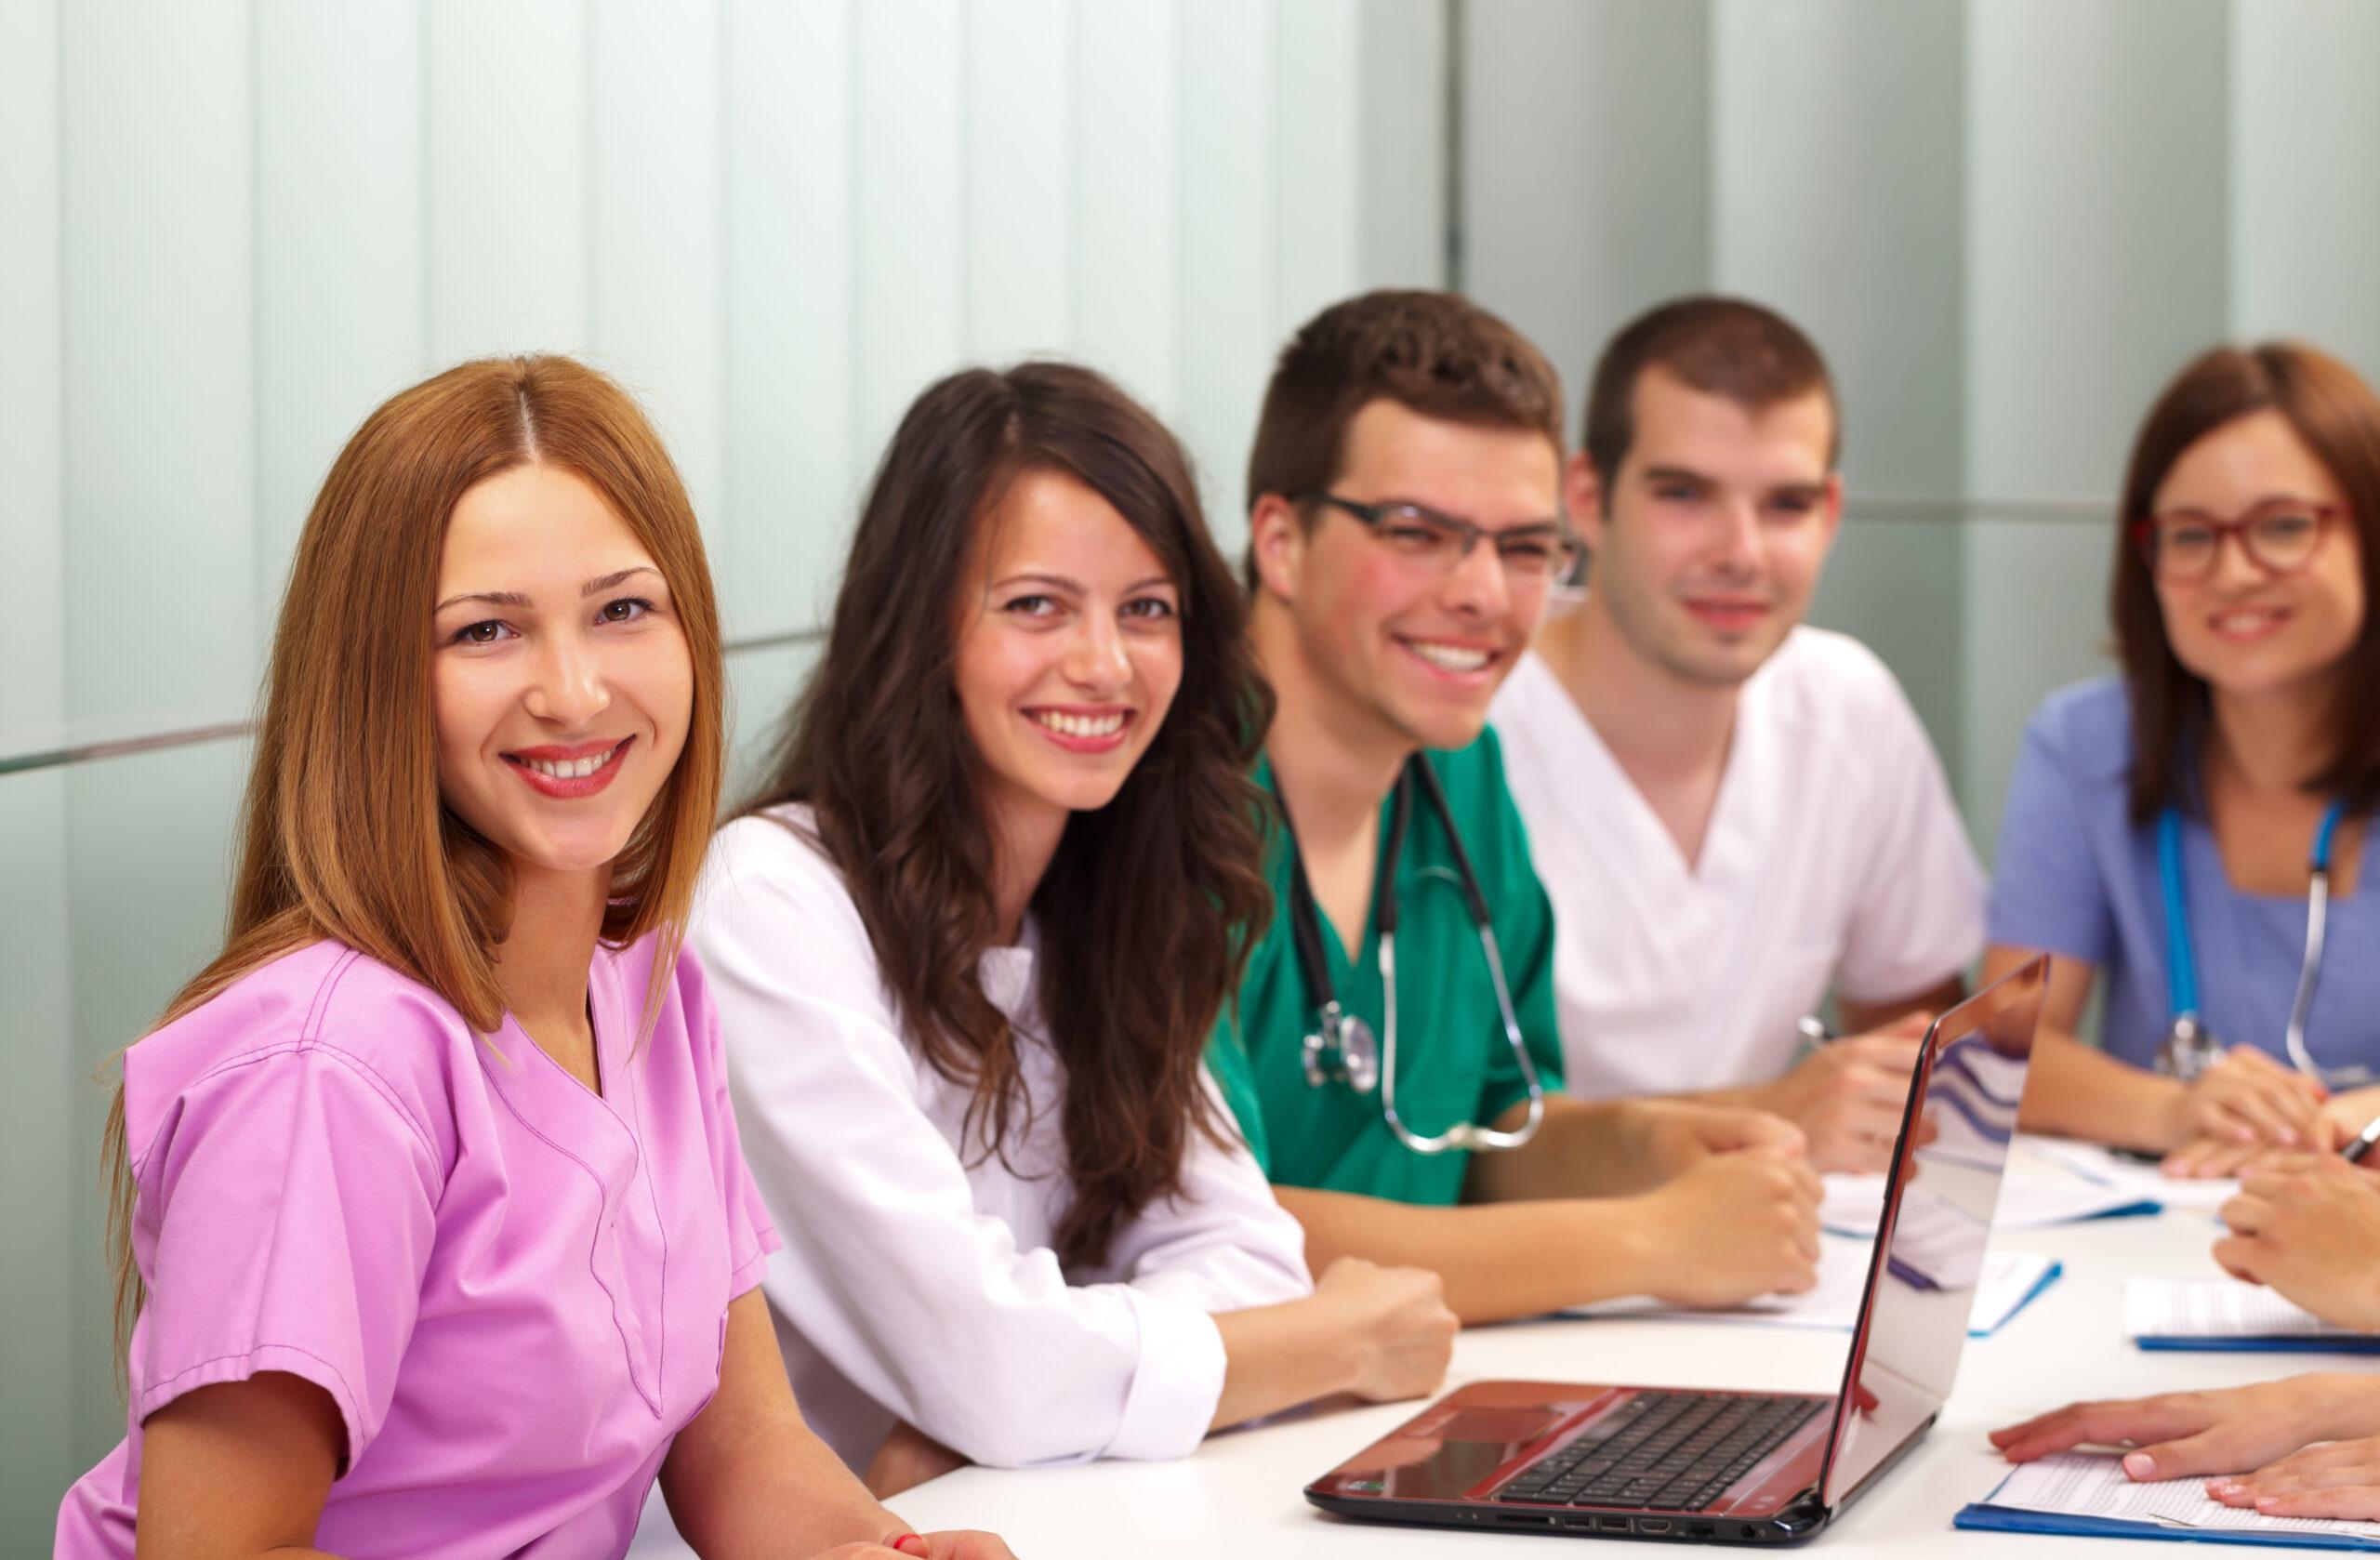 CNA Classes in Pennsylvania